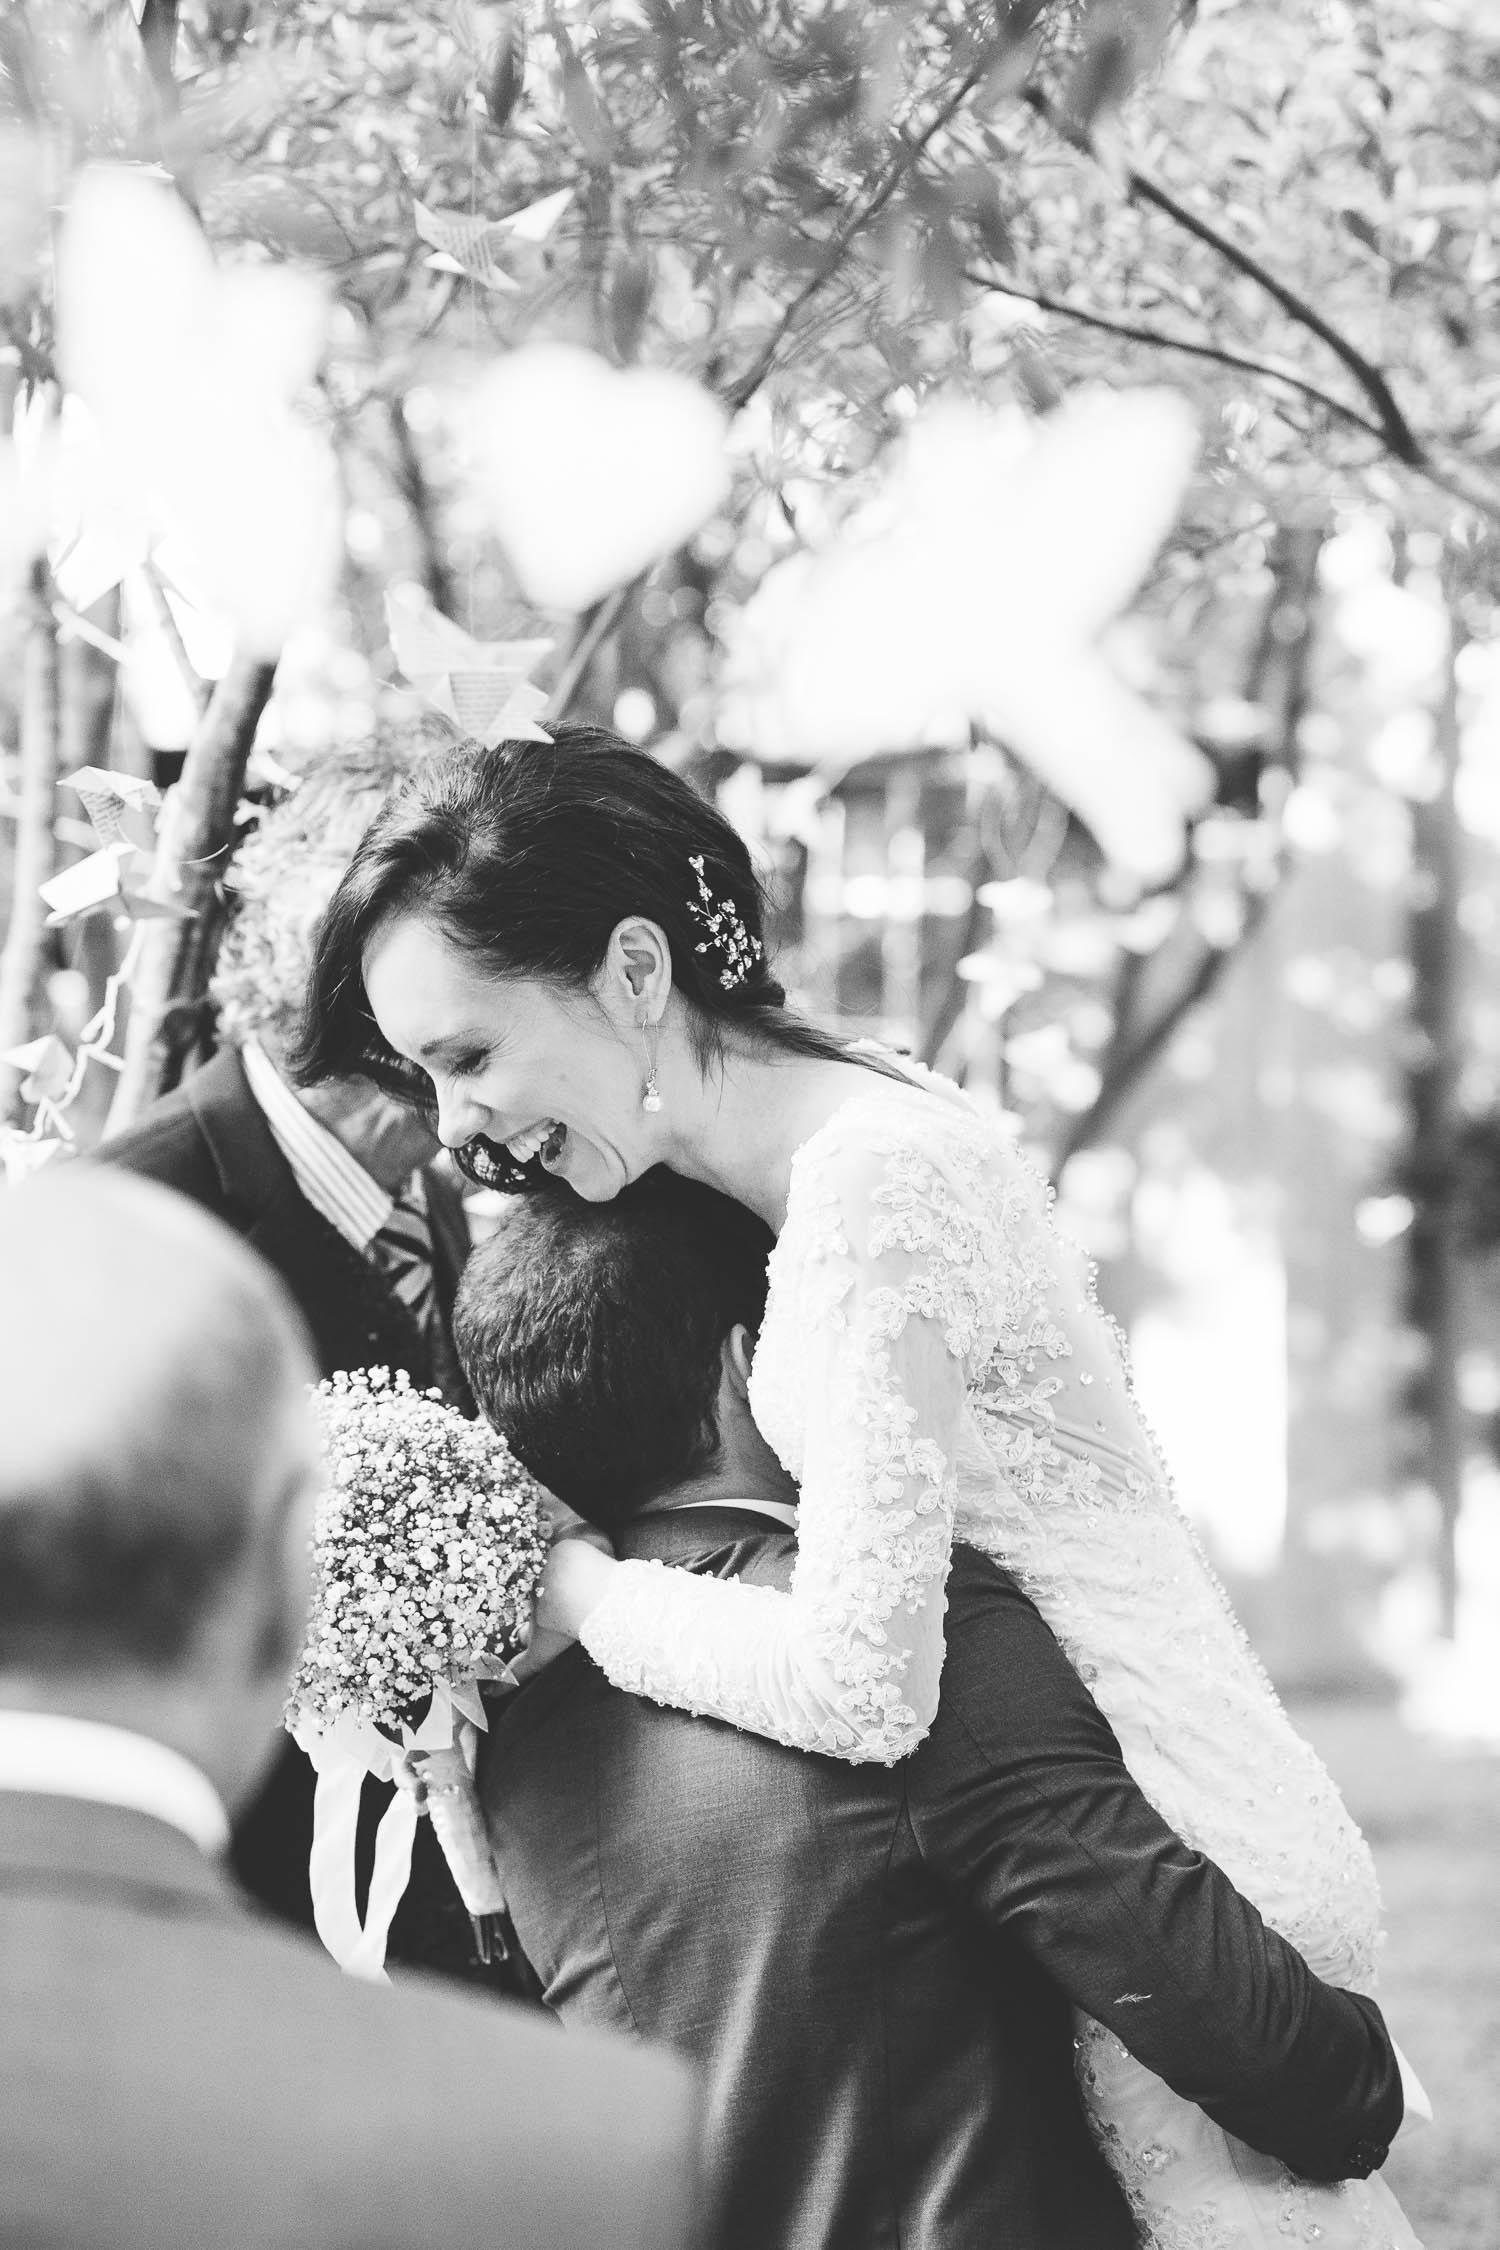 italian-wedding-city-urban-wedding-photographer-south-africa29.jpg